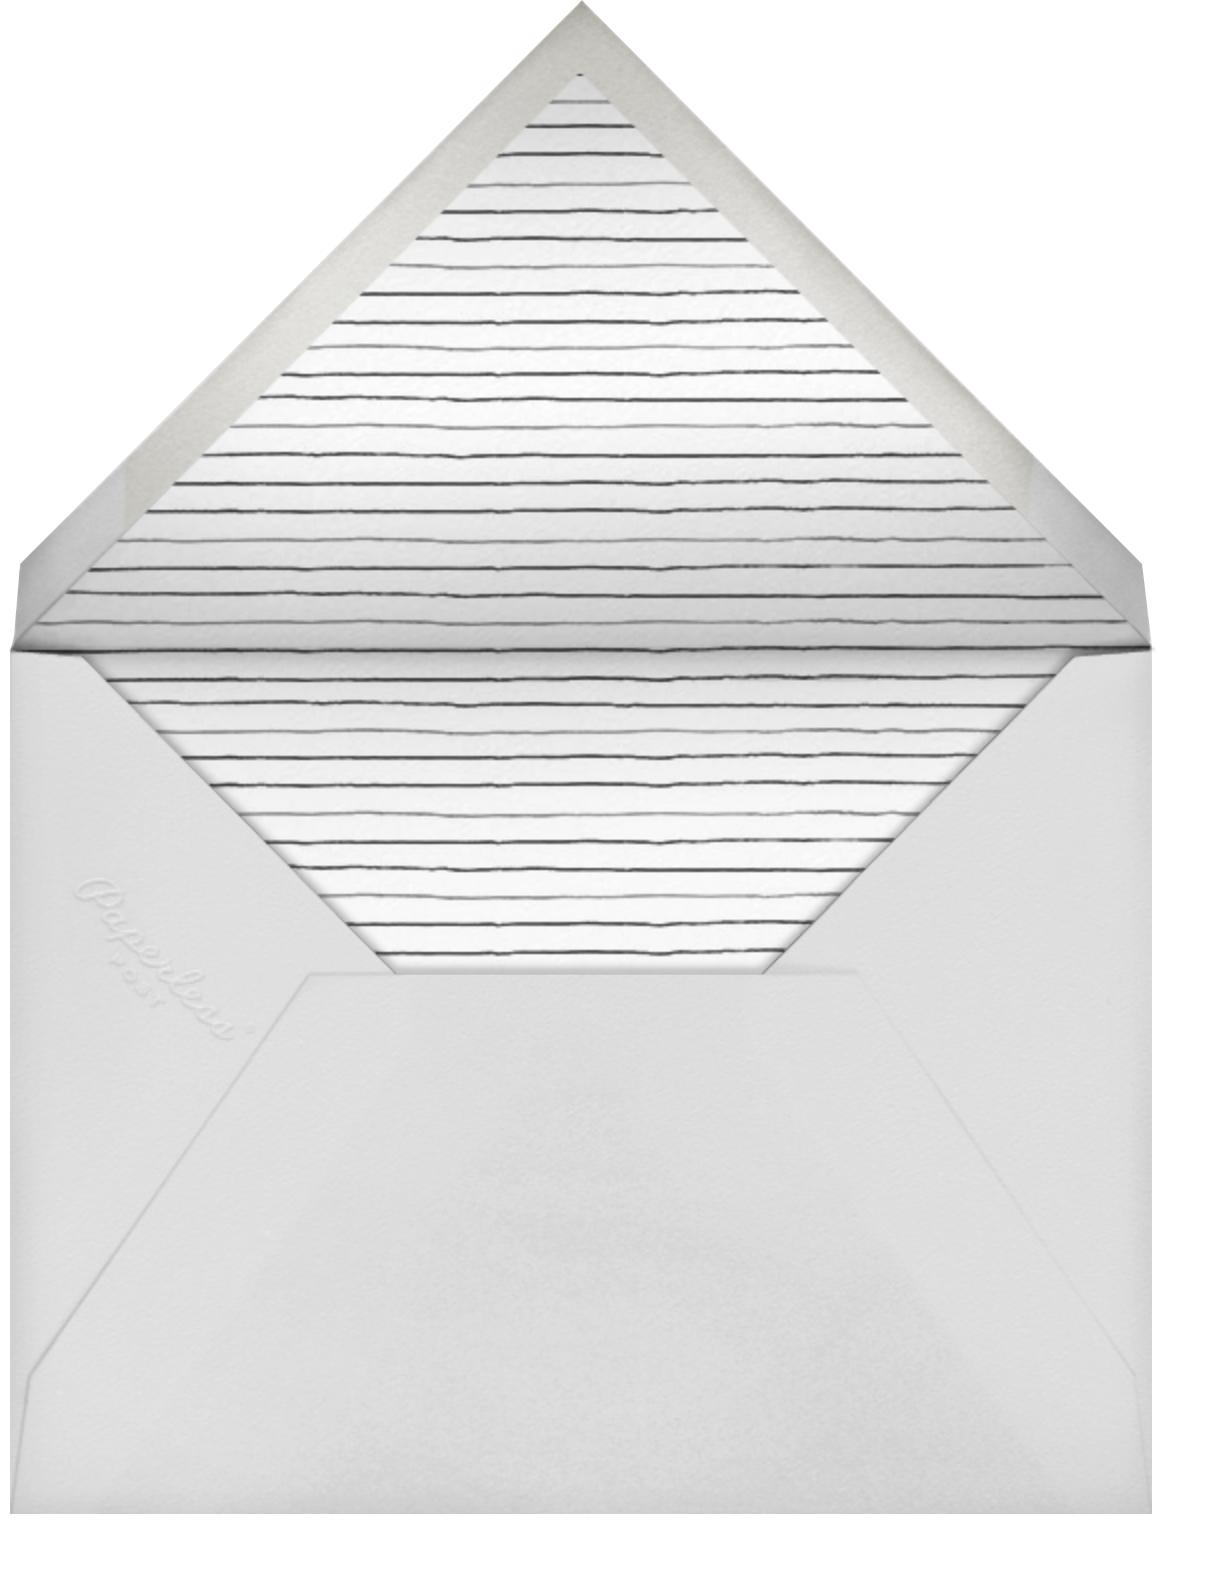 Duck Pin - Samphire - Paper Source - Baby shower - envelope back